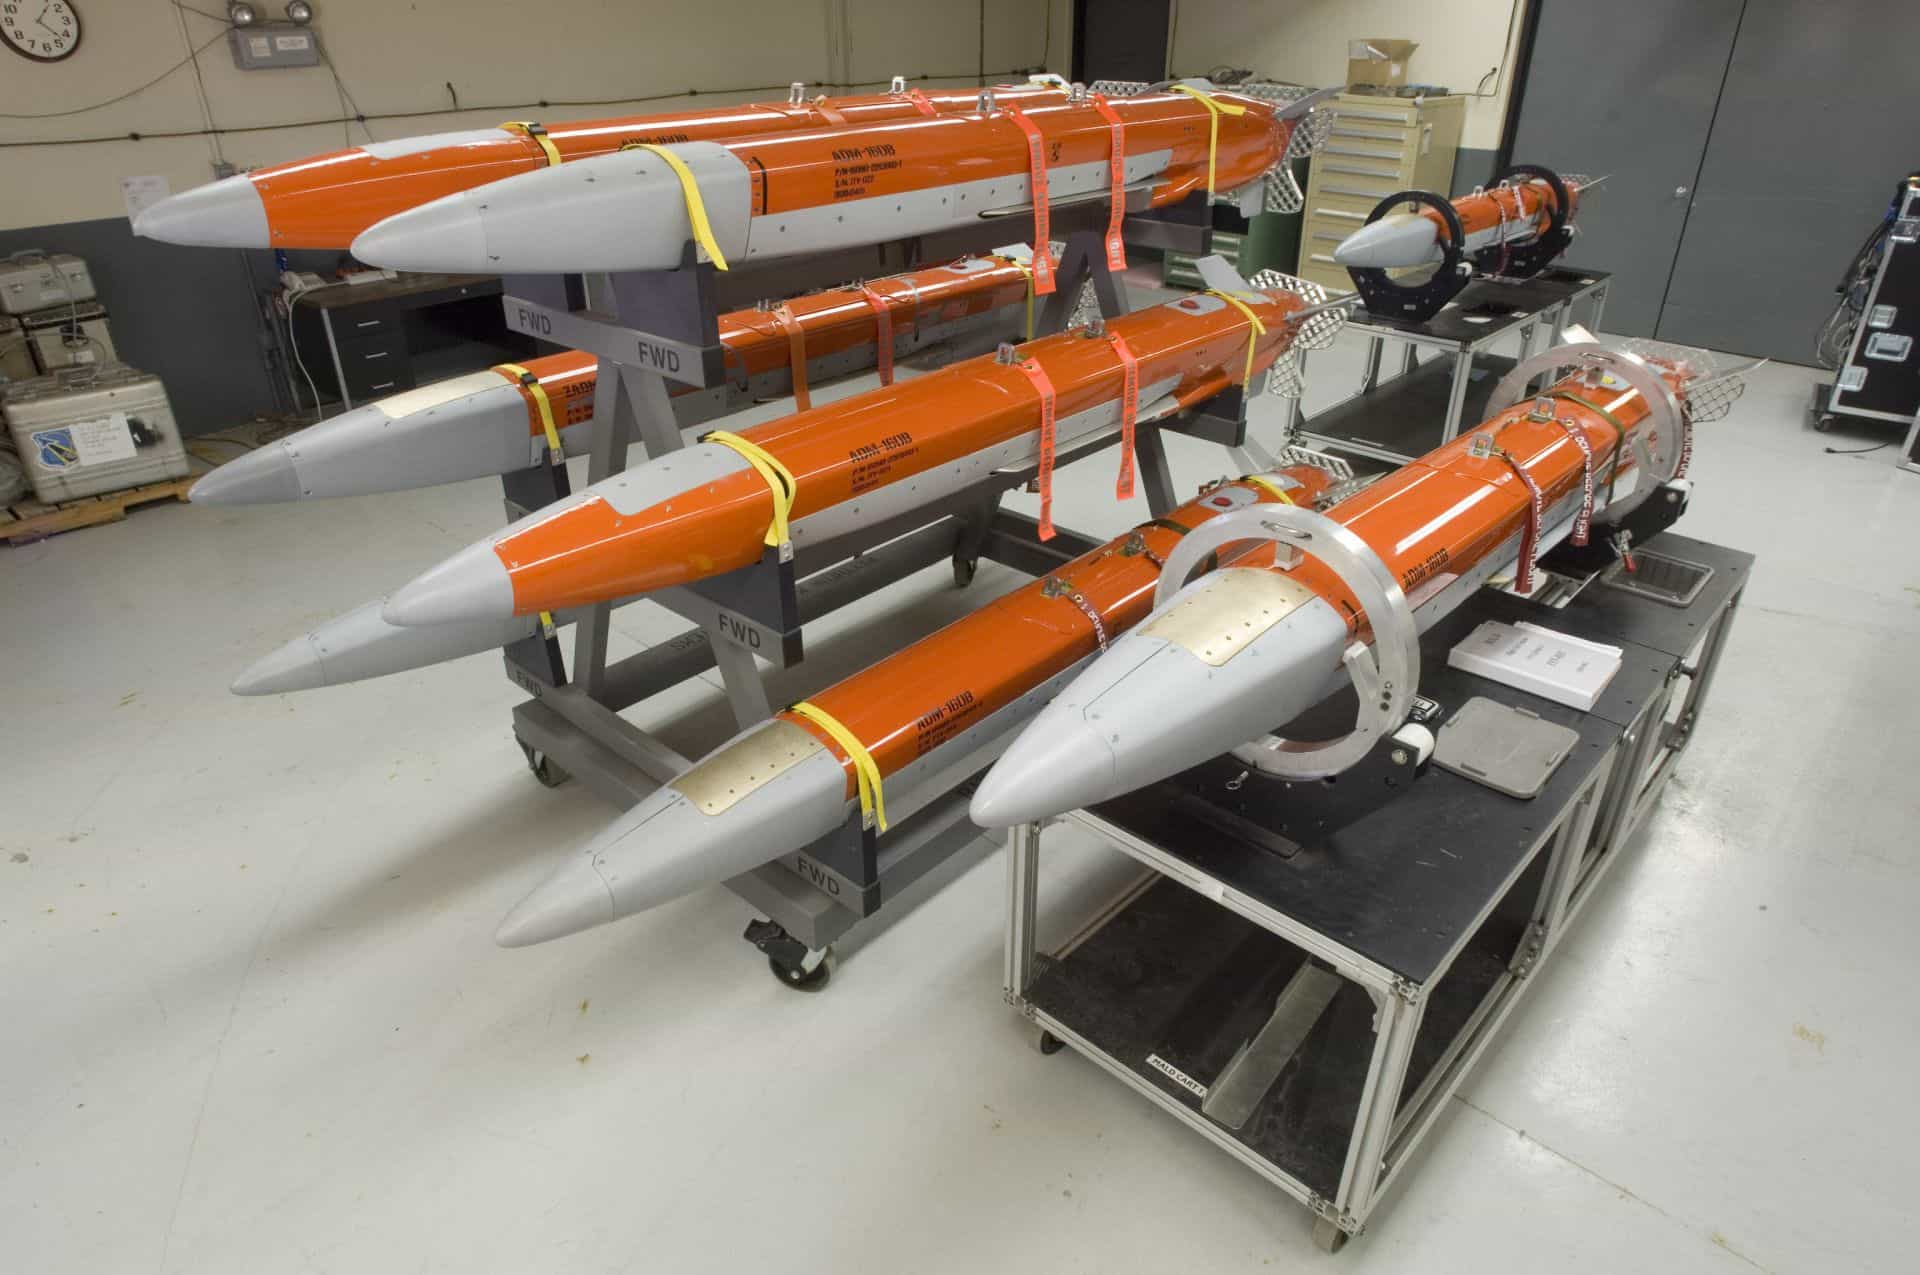 Raytheon Us Air Force Upgrade Mald J With Anti Jam